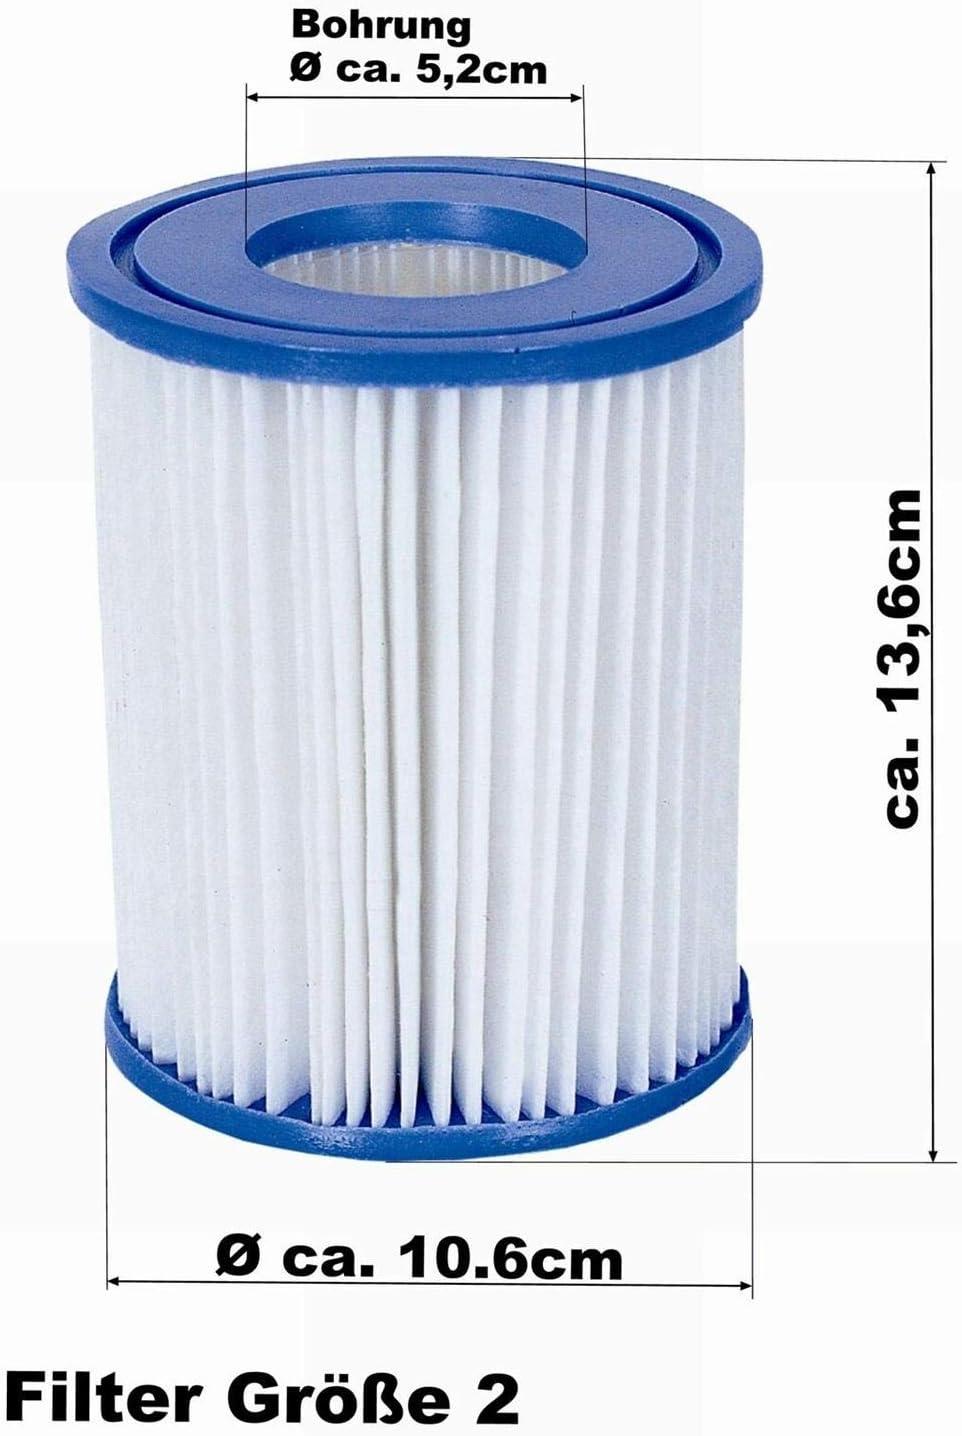 Bestway Global Holding Inc 6 x set of 2 size II diameter 10.6 cm x 13.6 cm 12 filter cartridges